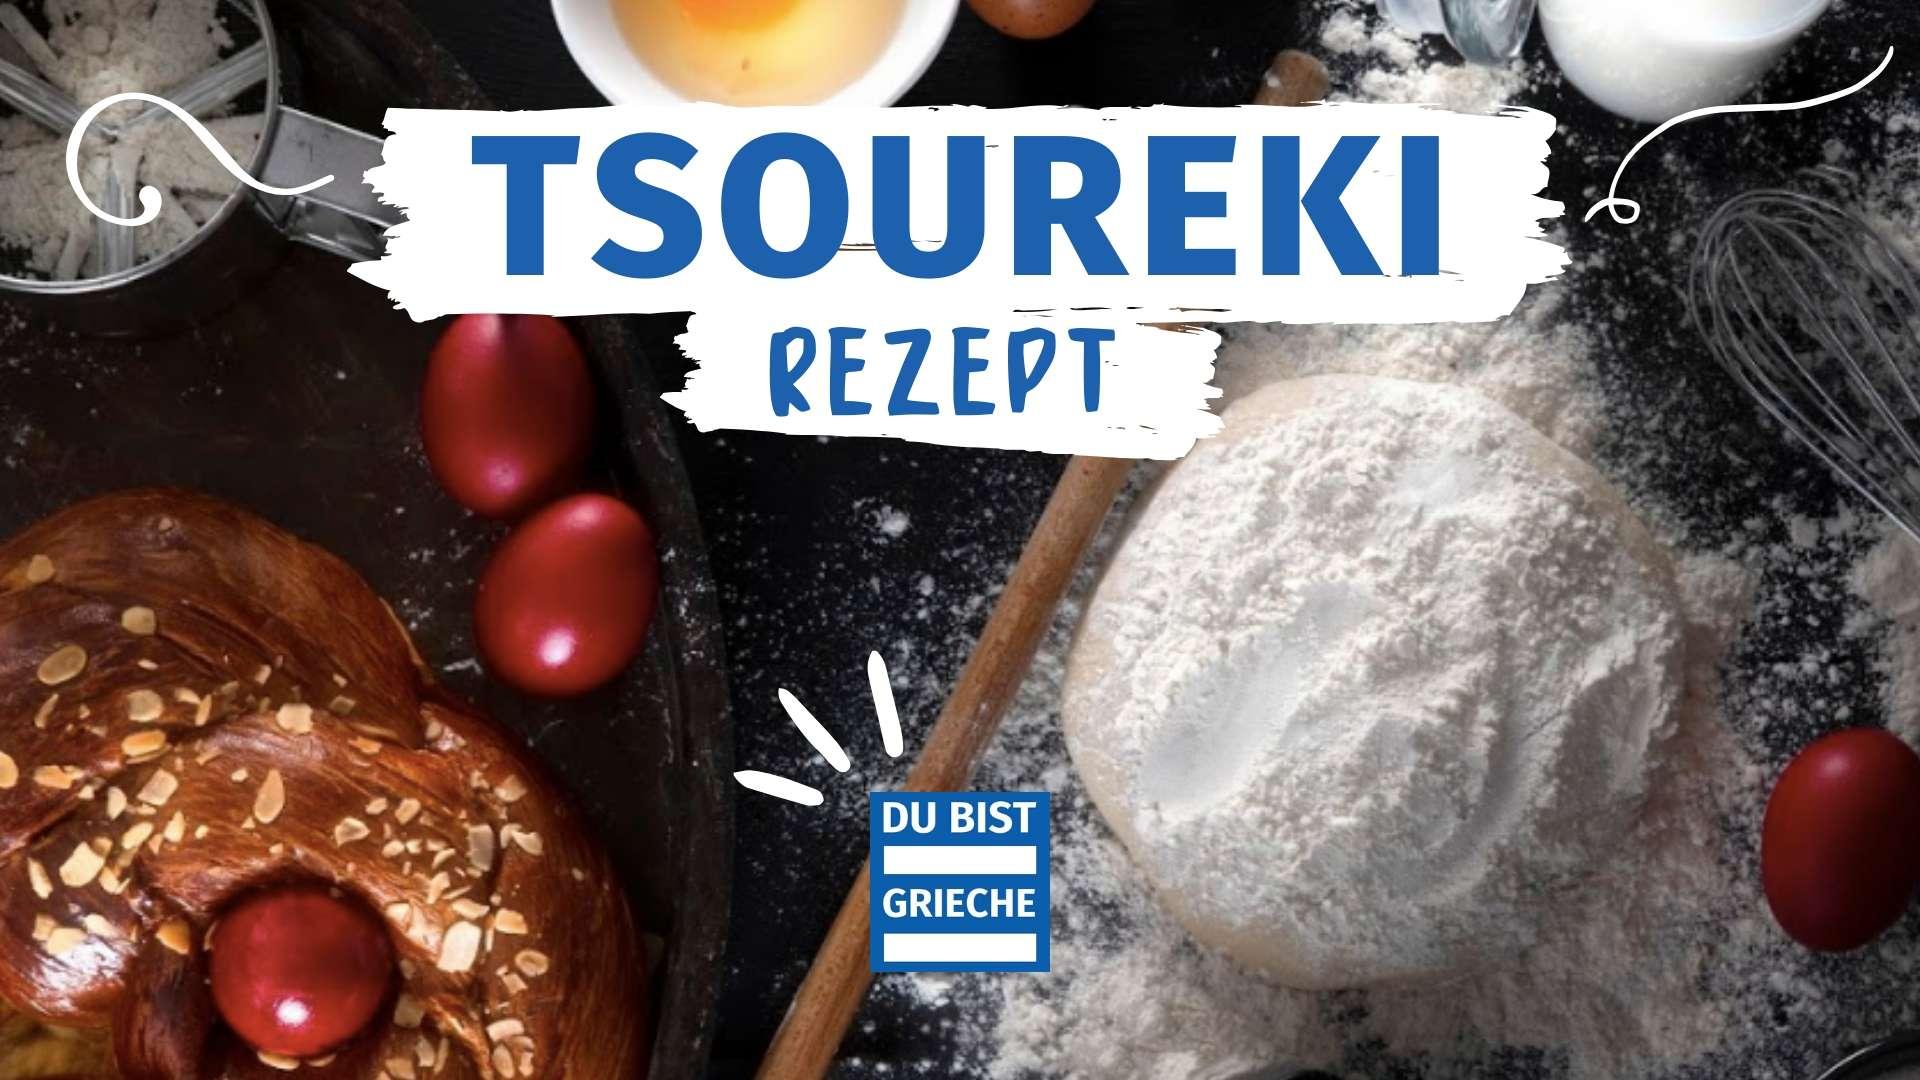 Giagias Tsoureki Rezept DU BIST GRIECHE Τσουρέκι Beitrag